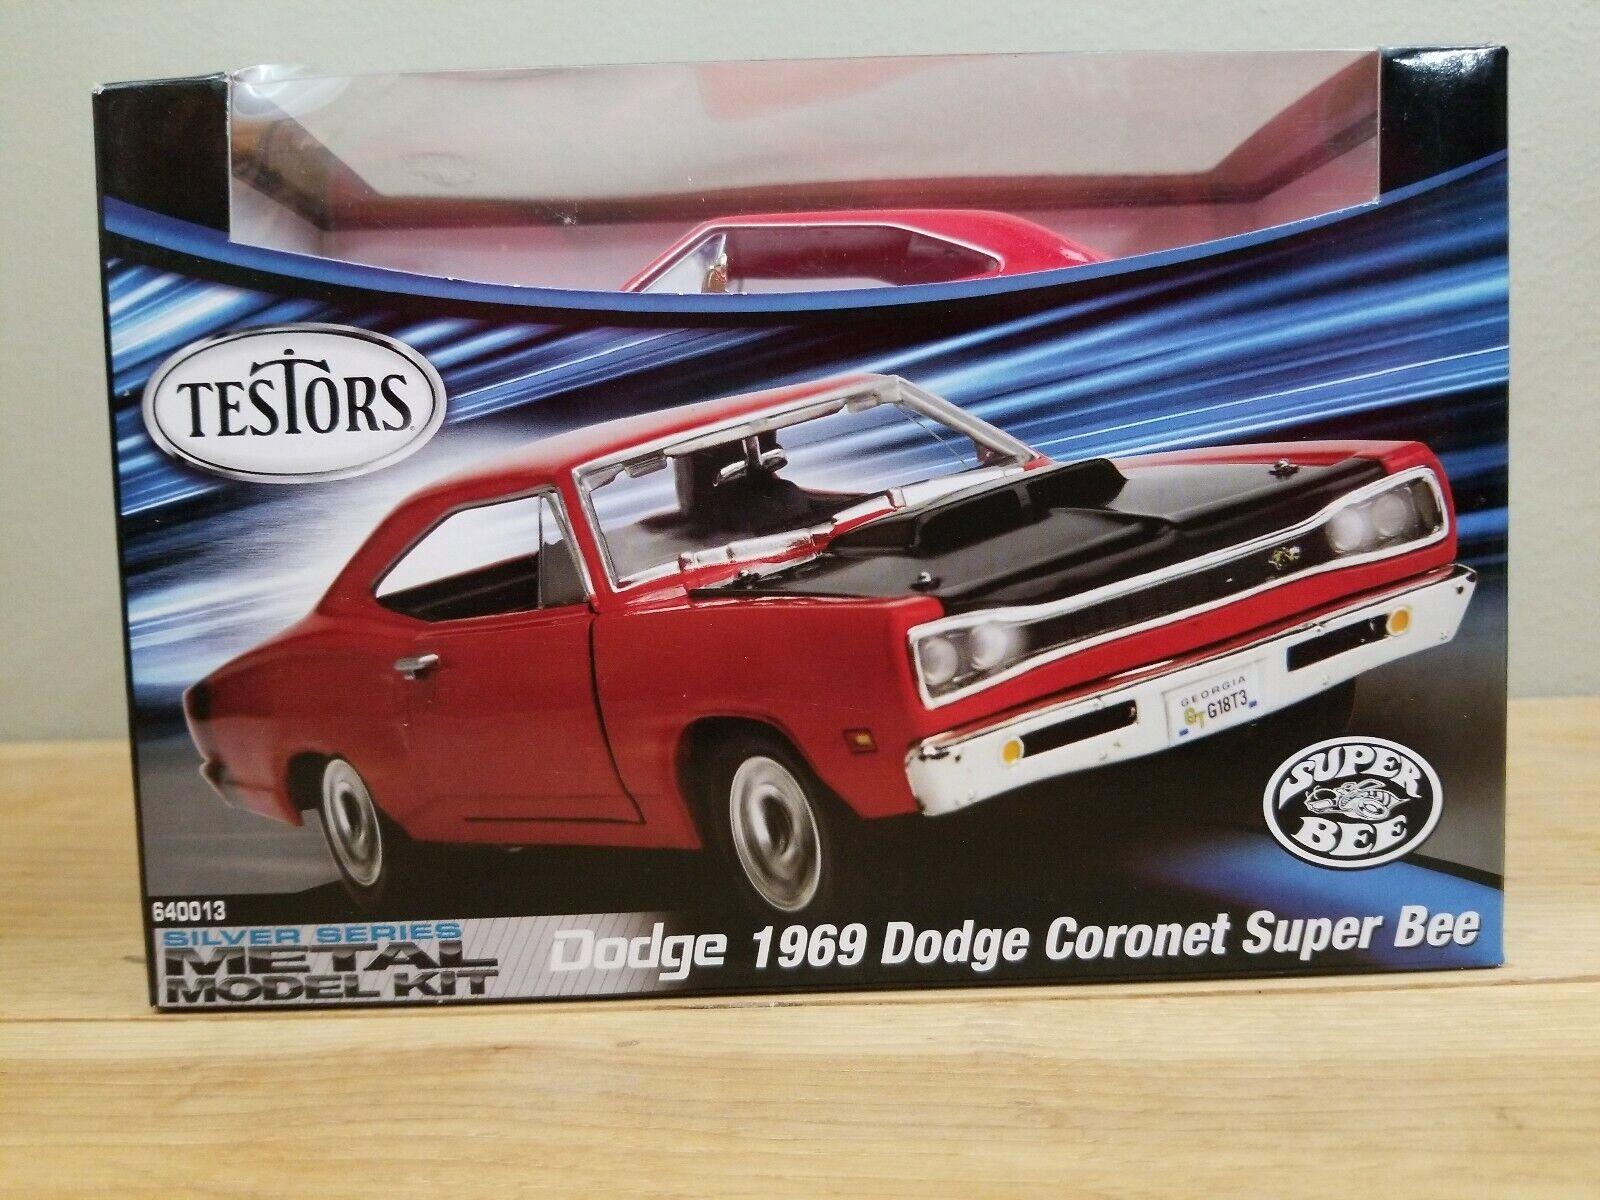 Testors silver Series 1969 Dodge Cguldnet Super Bee 1 24 röd